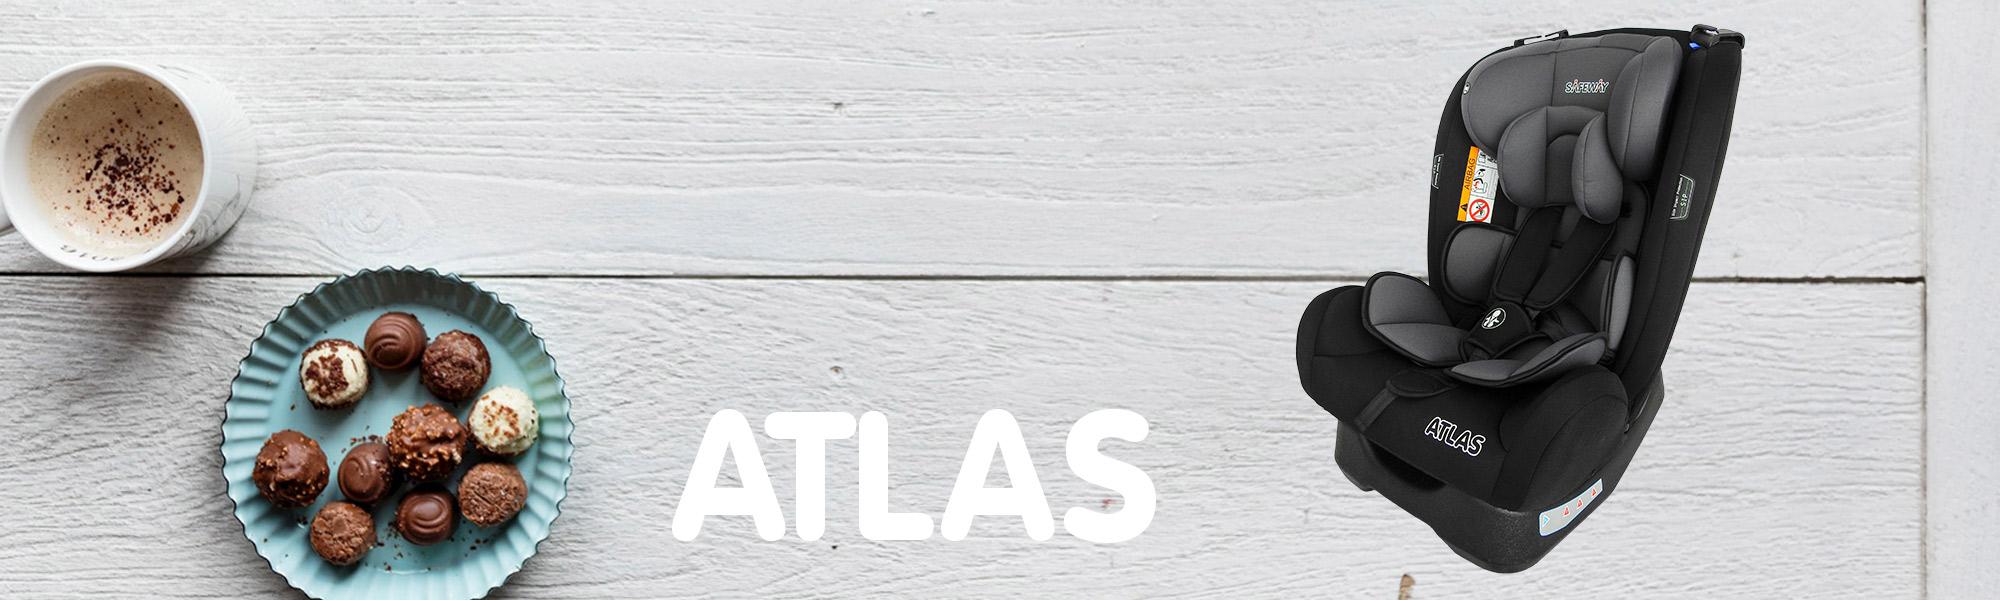 Atlas-2000x600